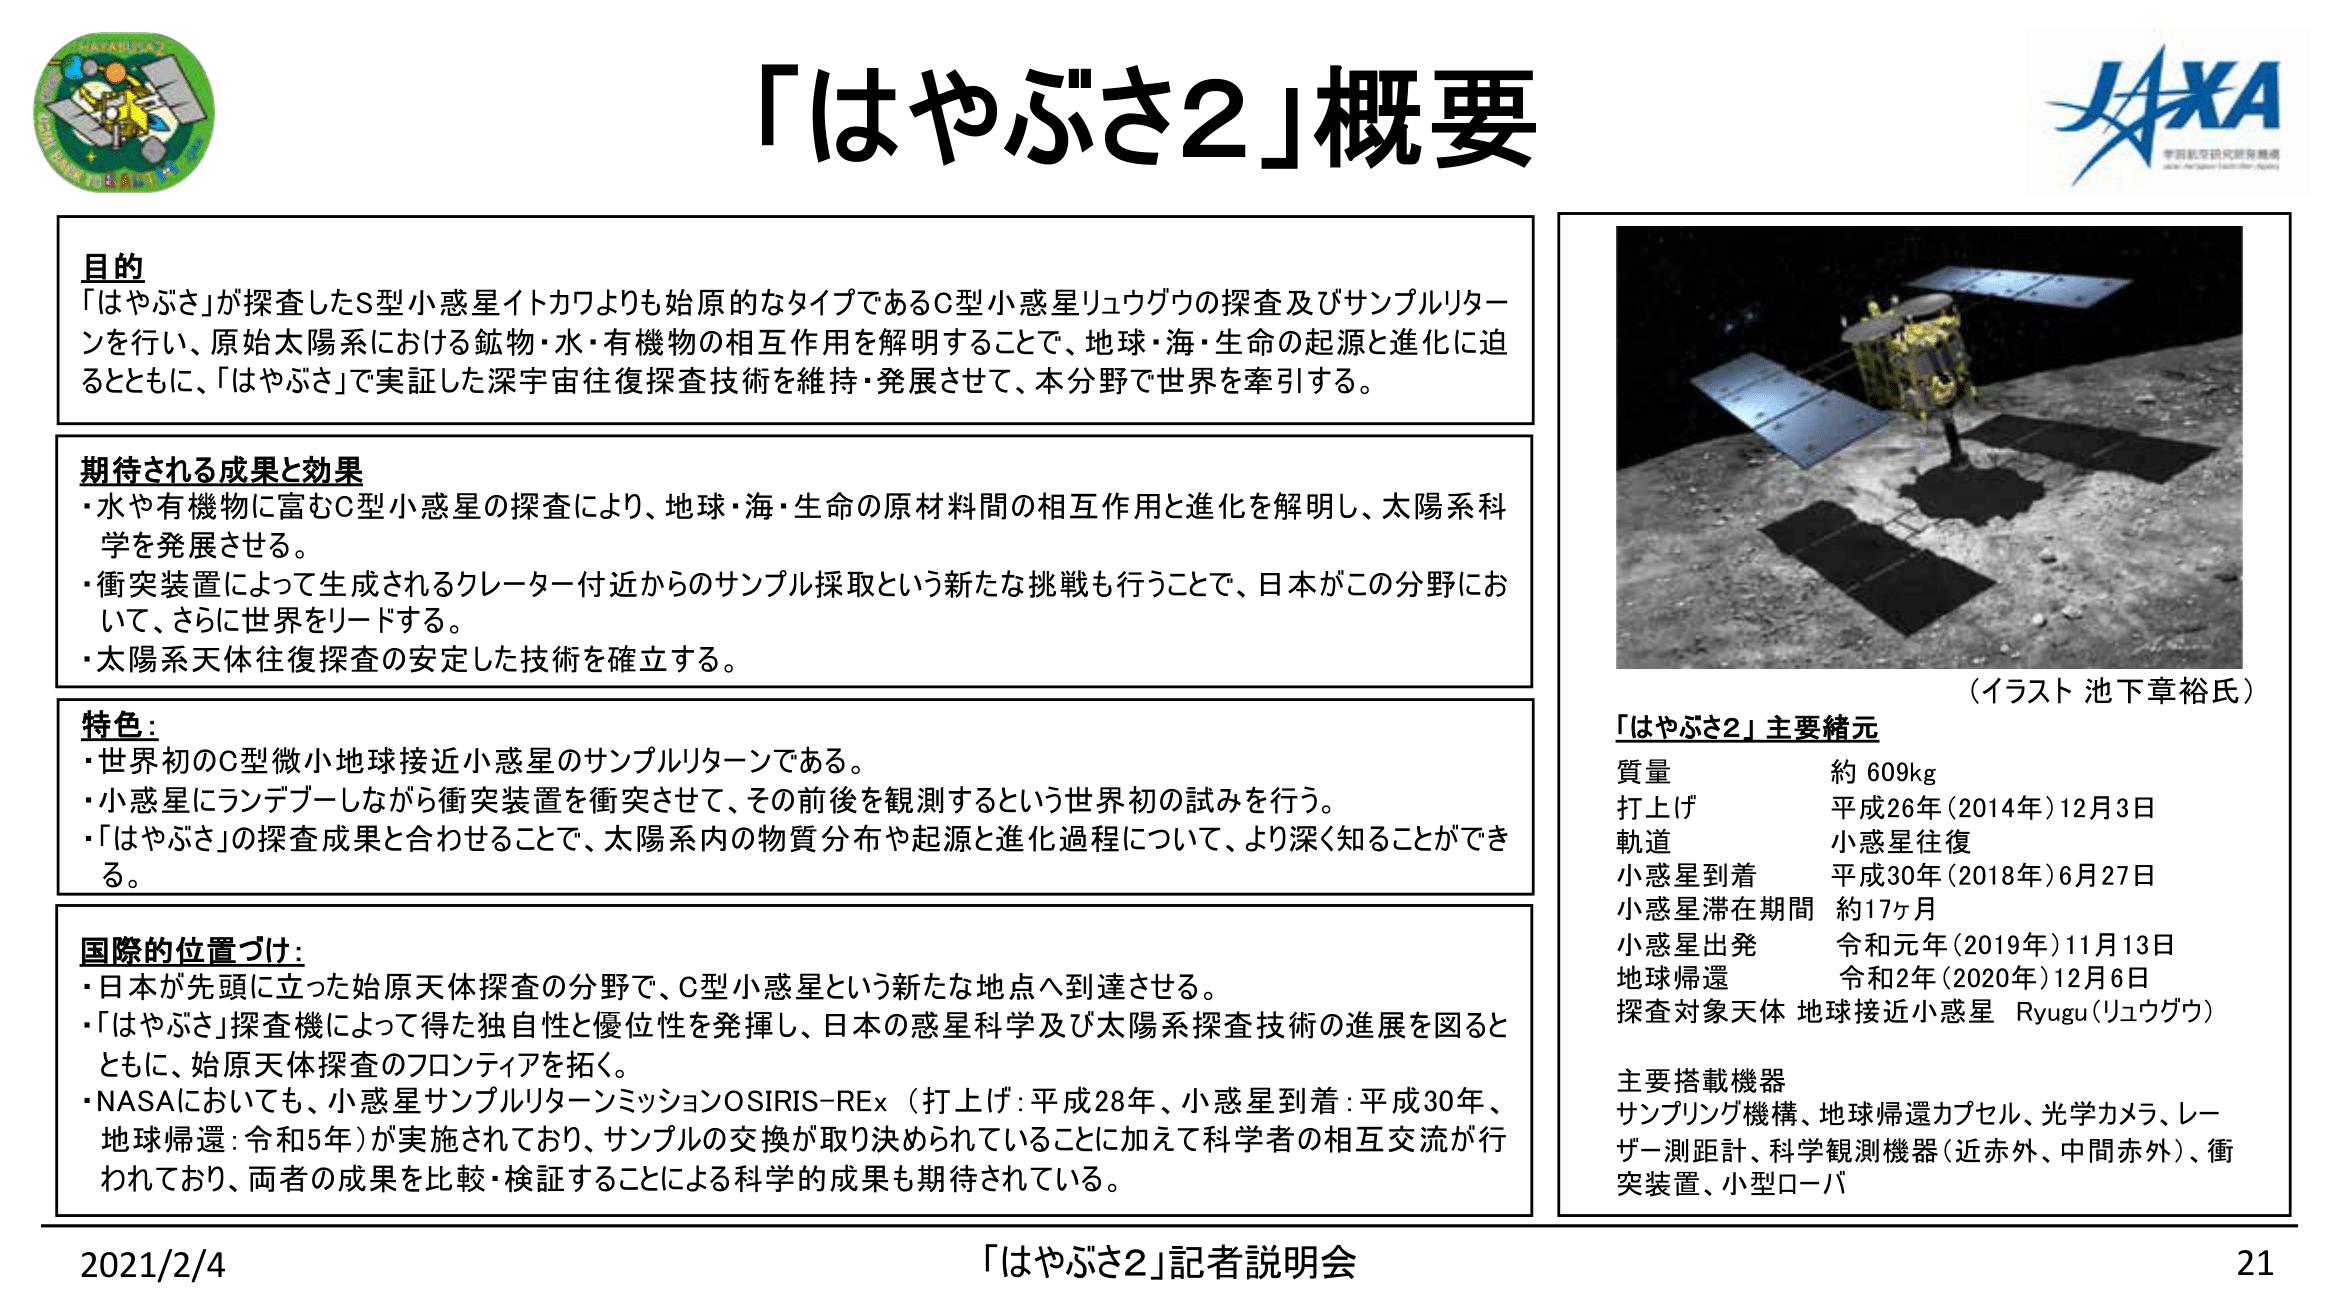 f:id:Imamura:20210204134445p:plain